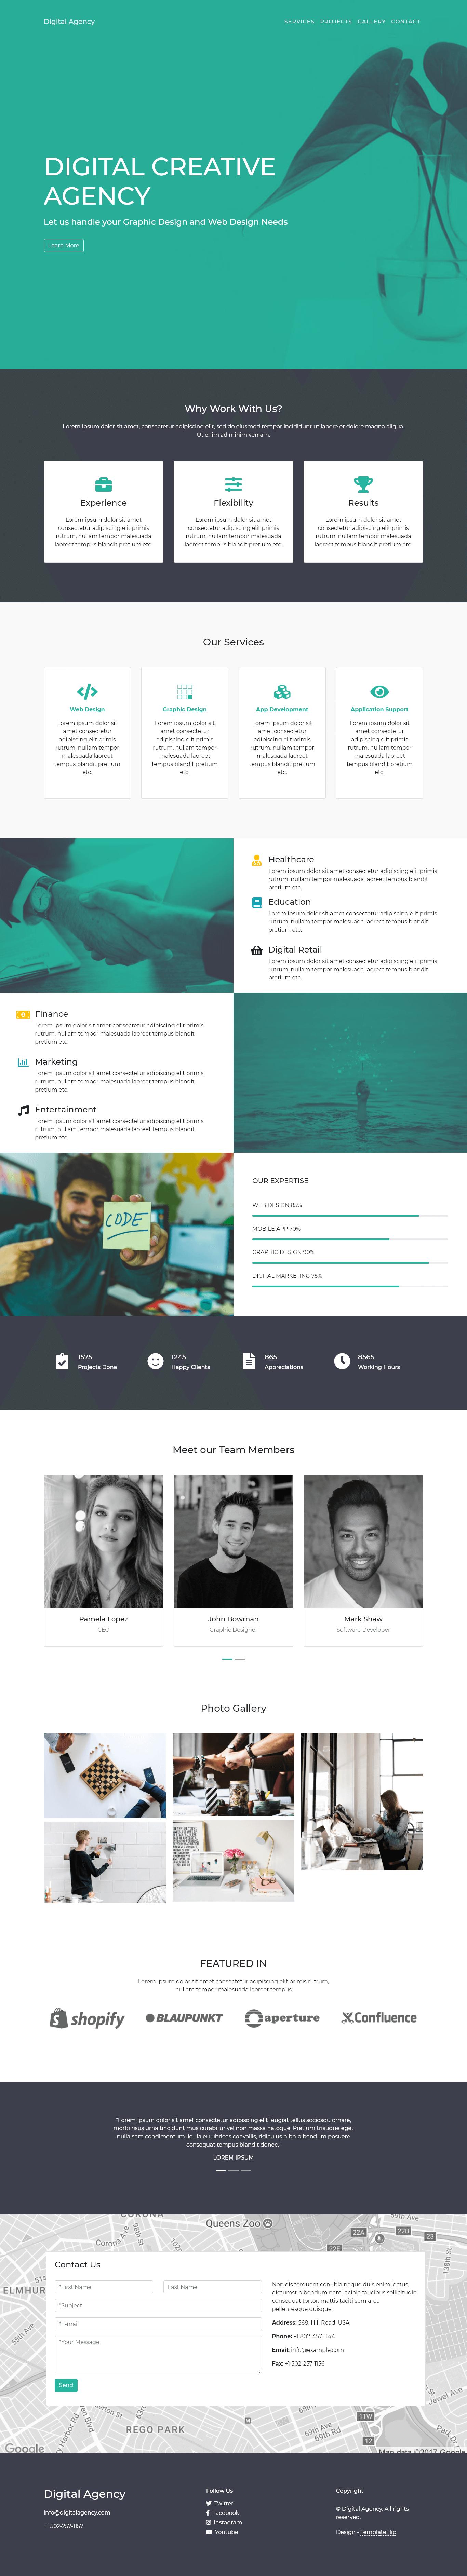 digital agency full